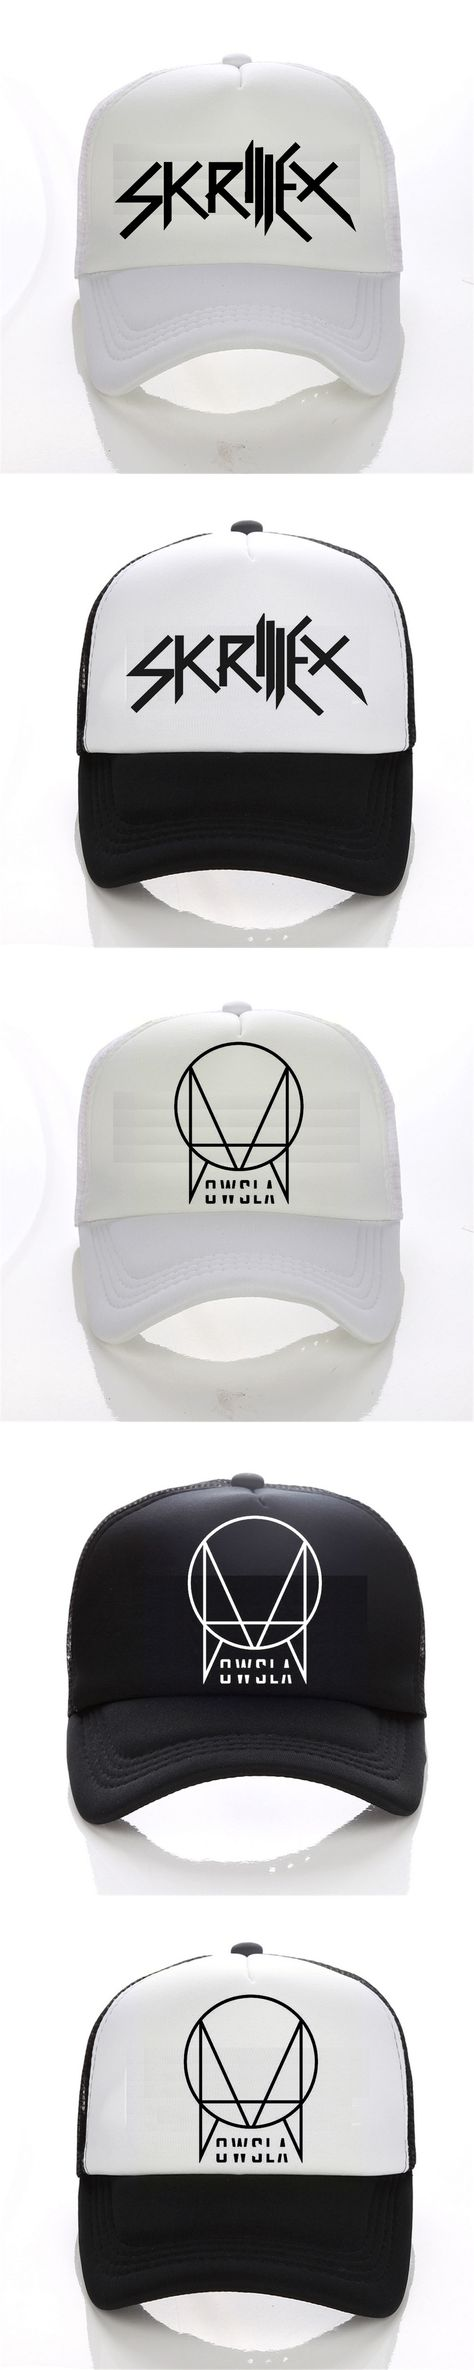 8e48427a7d5 New summer owsla logo cap men skrillex baseball cap men hip hop women  snapback jpg 474x2370